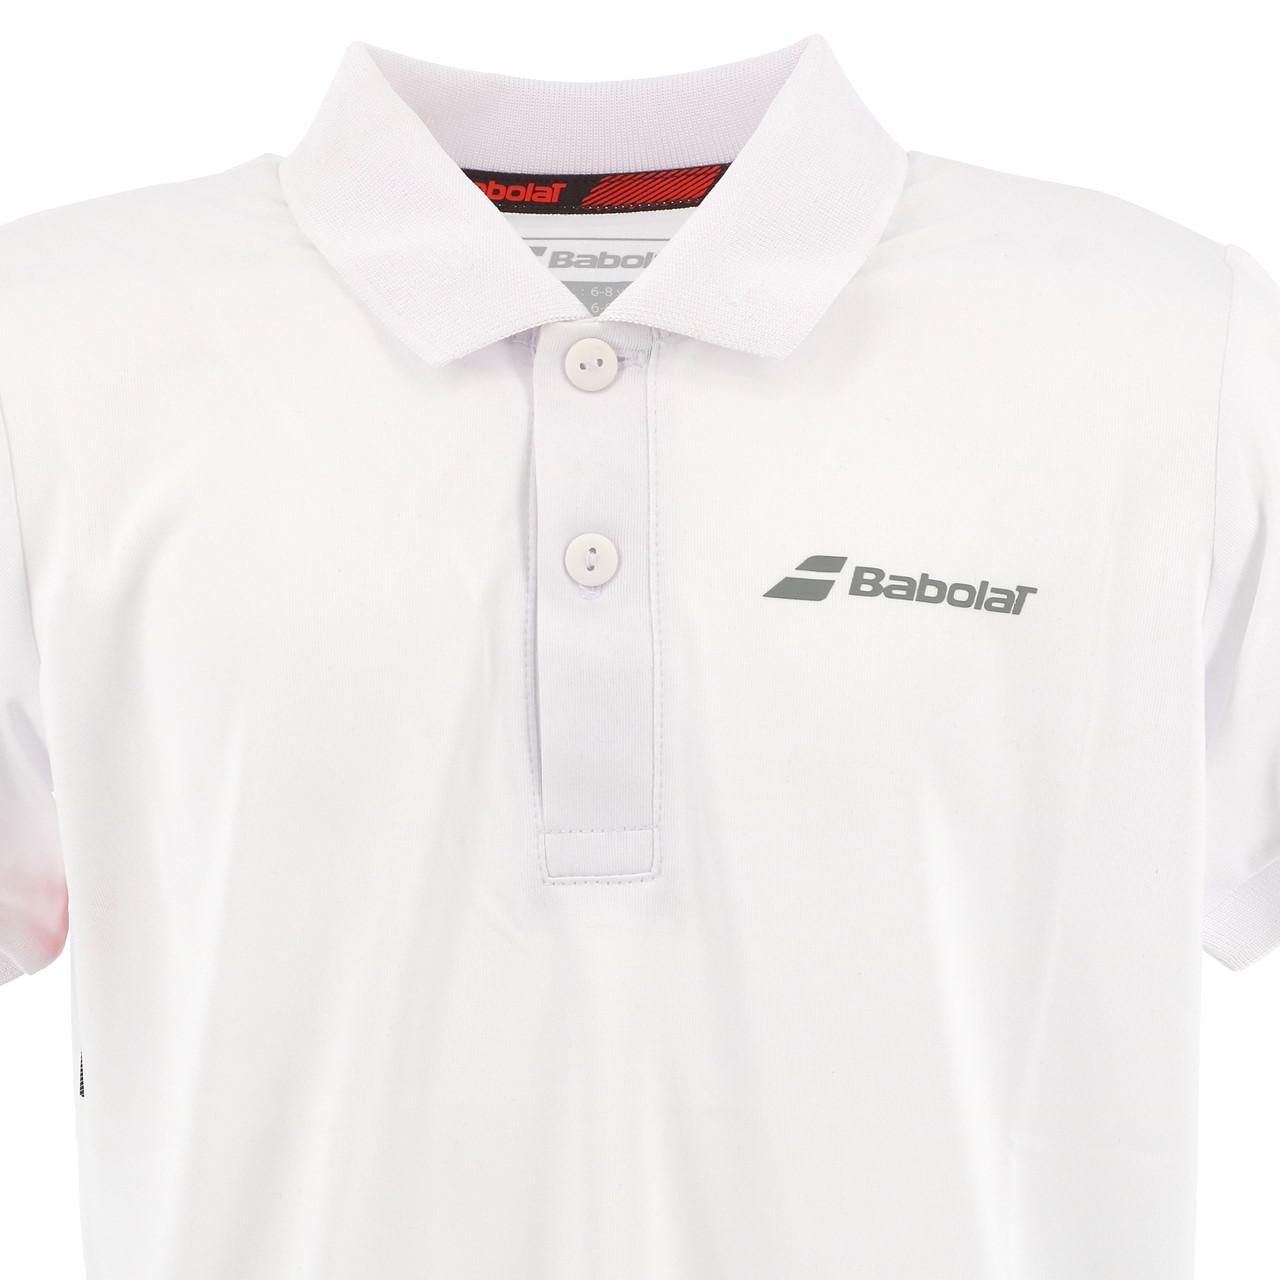 Polo-Von-Tennis-Babolat-Polo-Kind-Weiss-Weiss-71214-Neu Indexbild 2